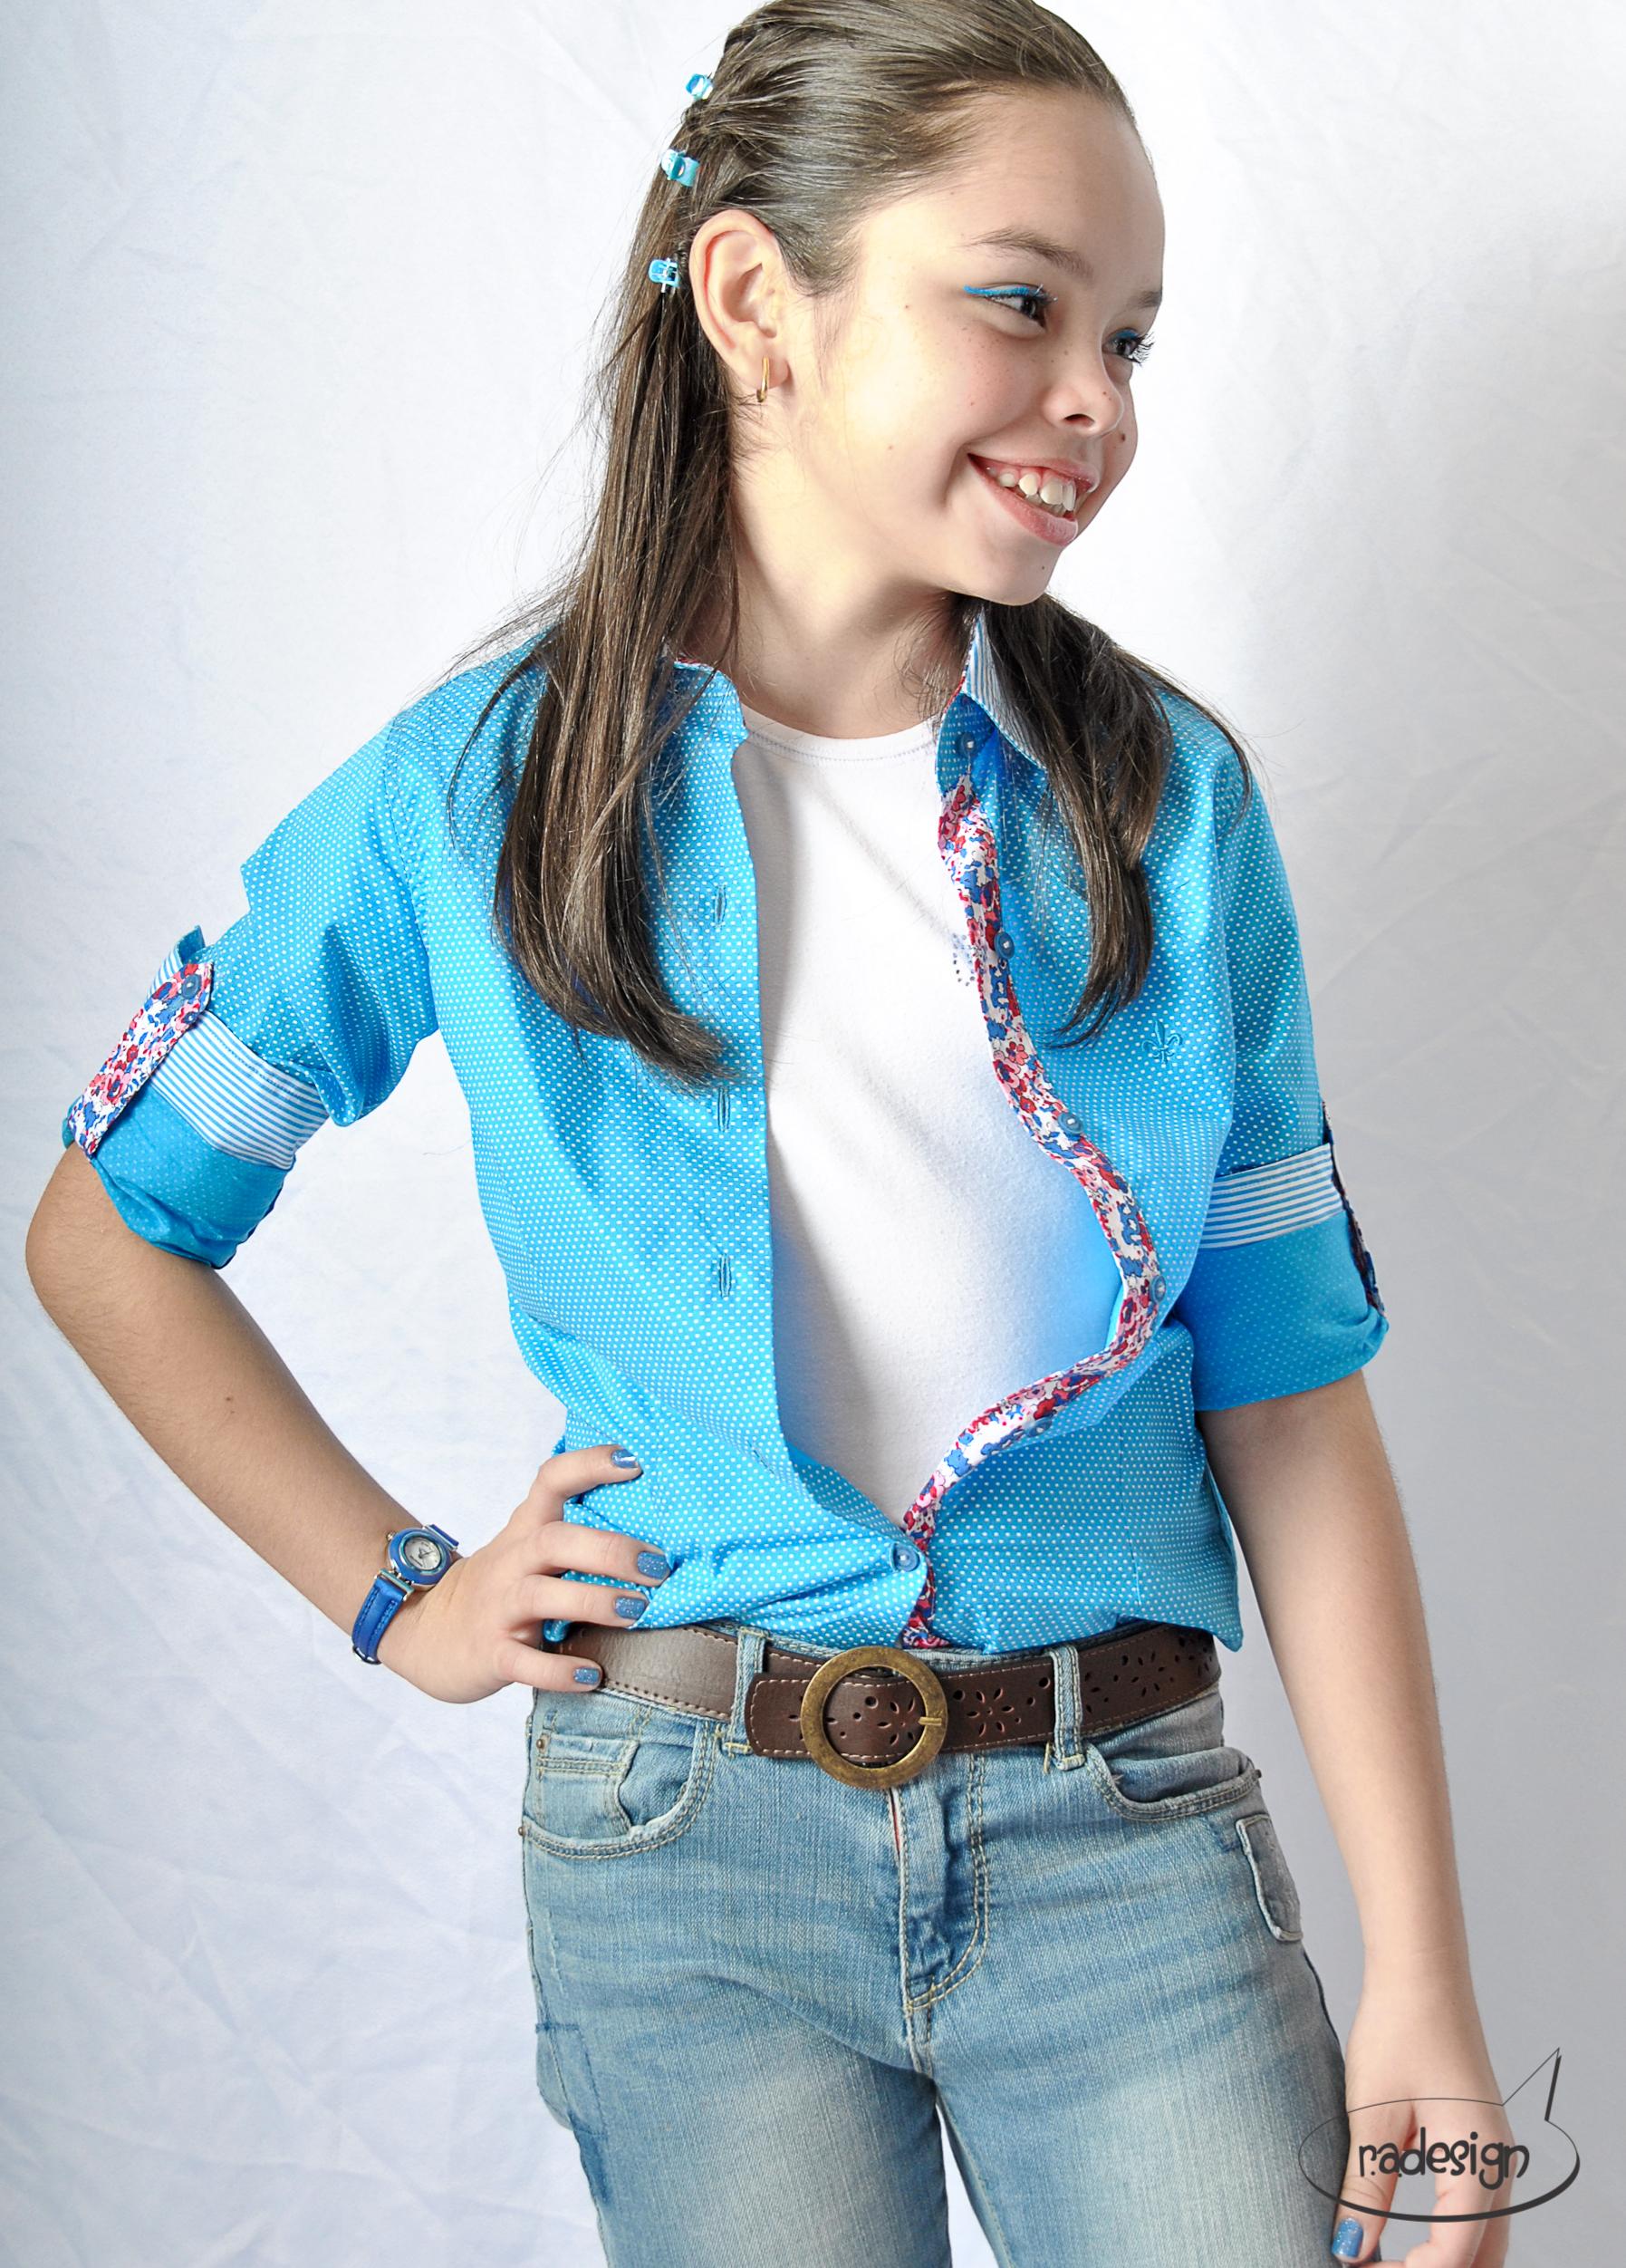 10 Anos Ana Luisa 016.jpg